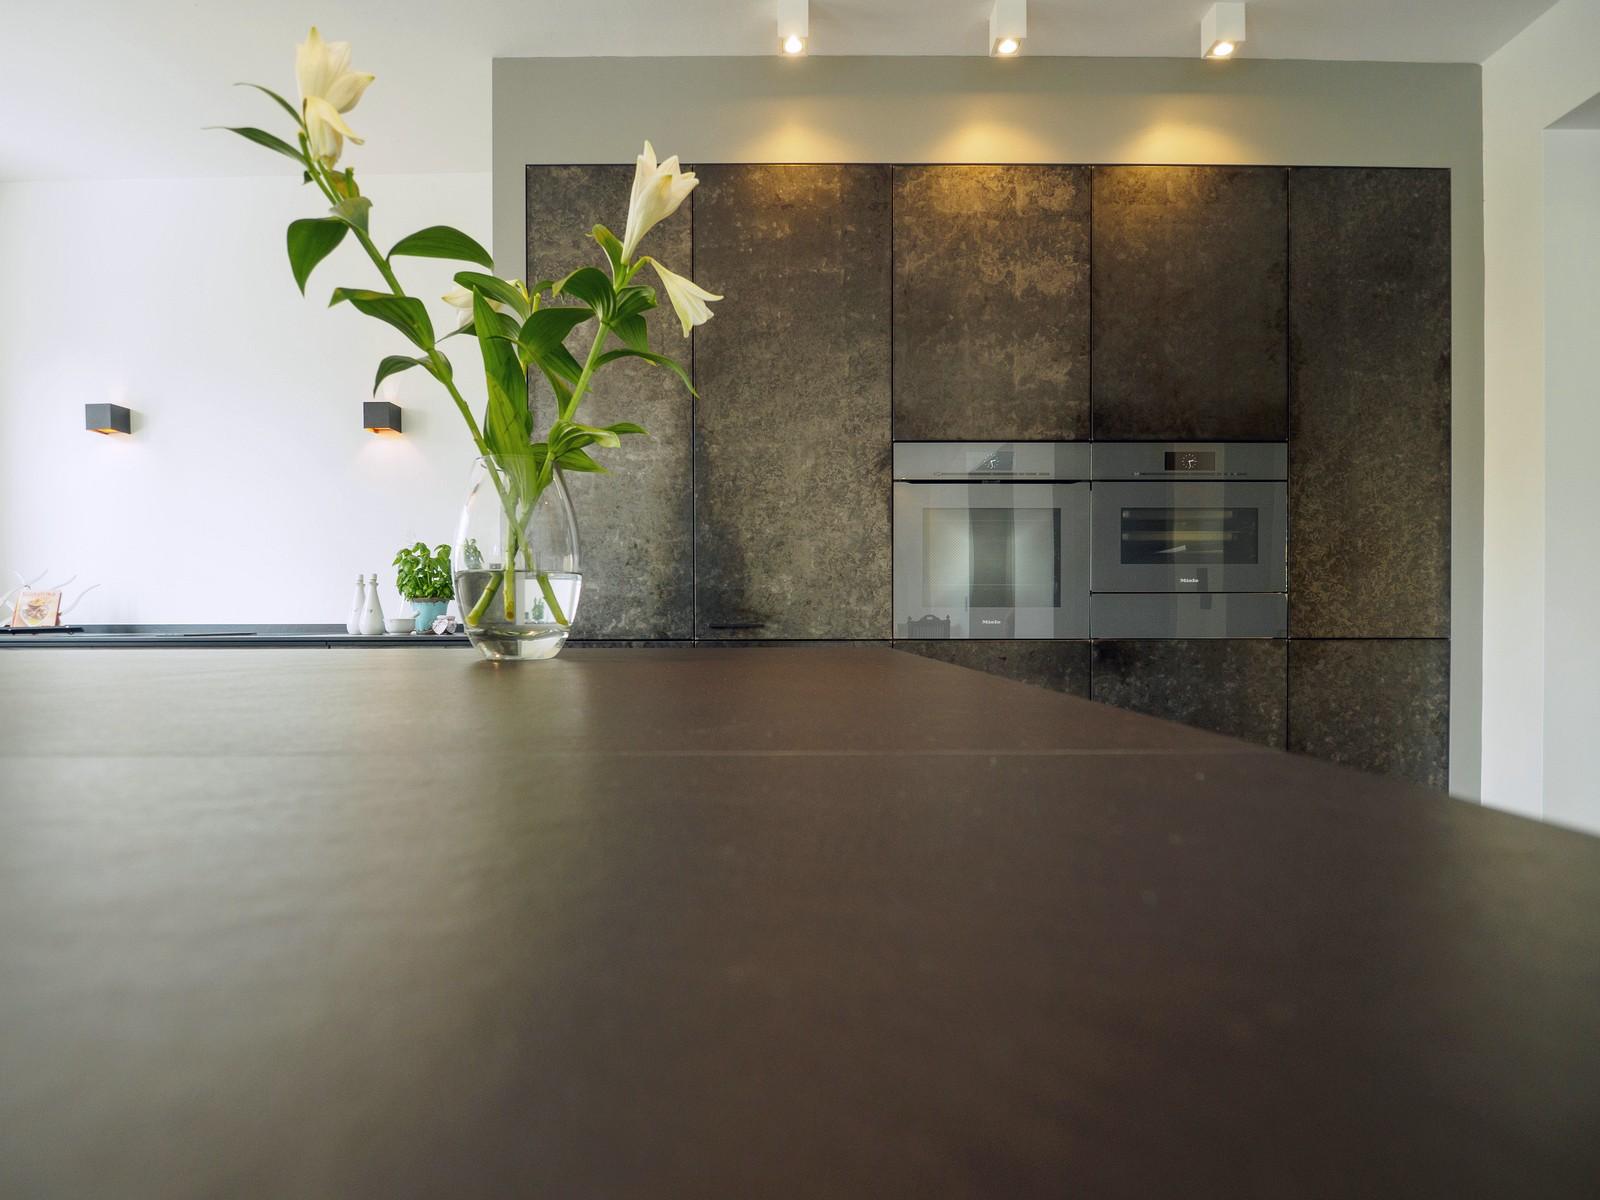 Kueche Exklusiv Design Fronten Holz Furnier Sonnenverbrannt Stahl Keramik Arbeitsplatte Miele 16